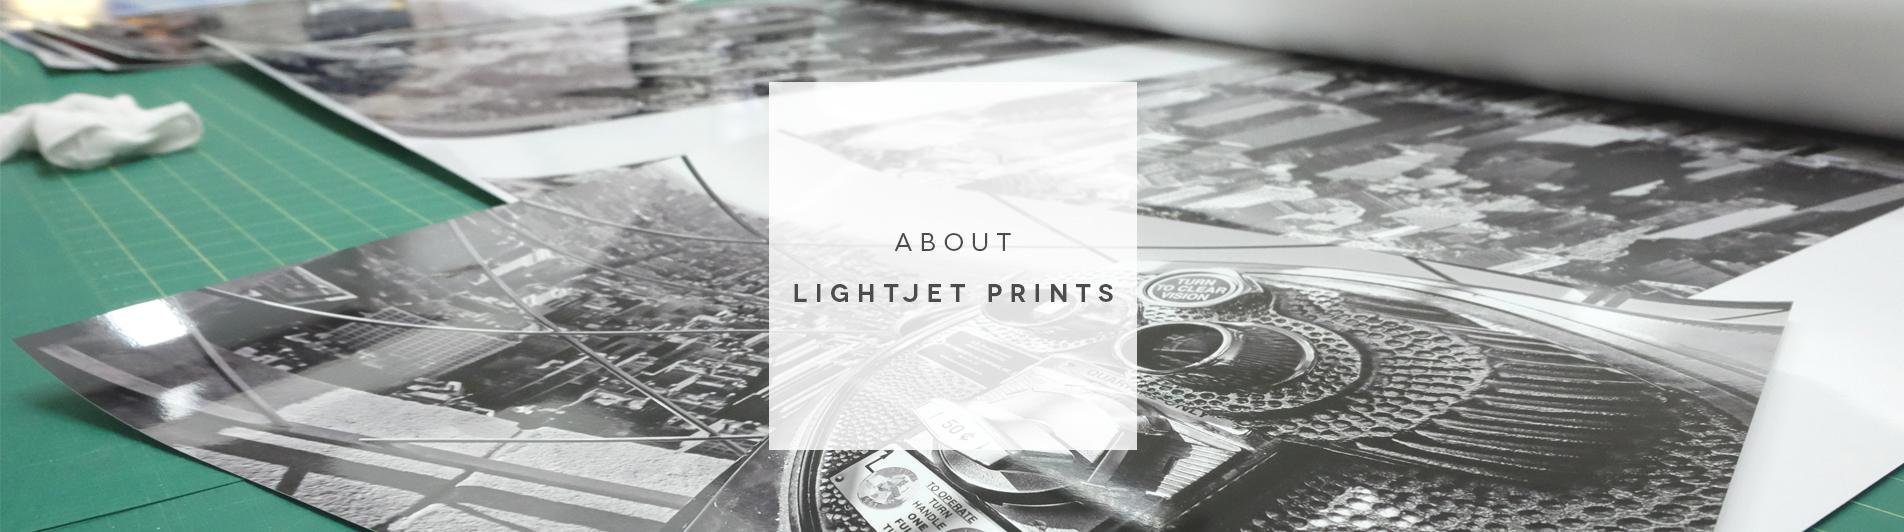 About Lightjet Prints